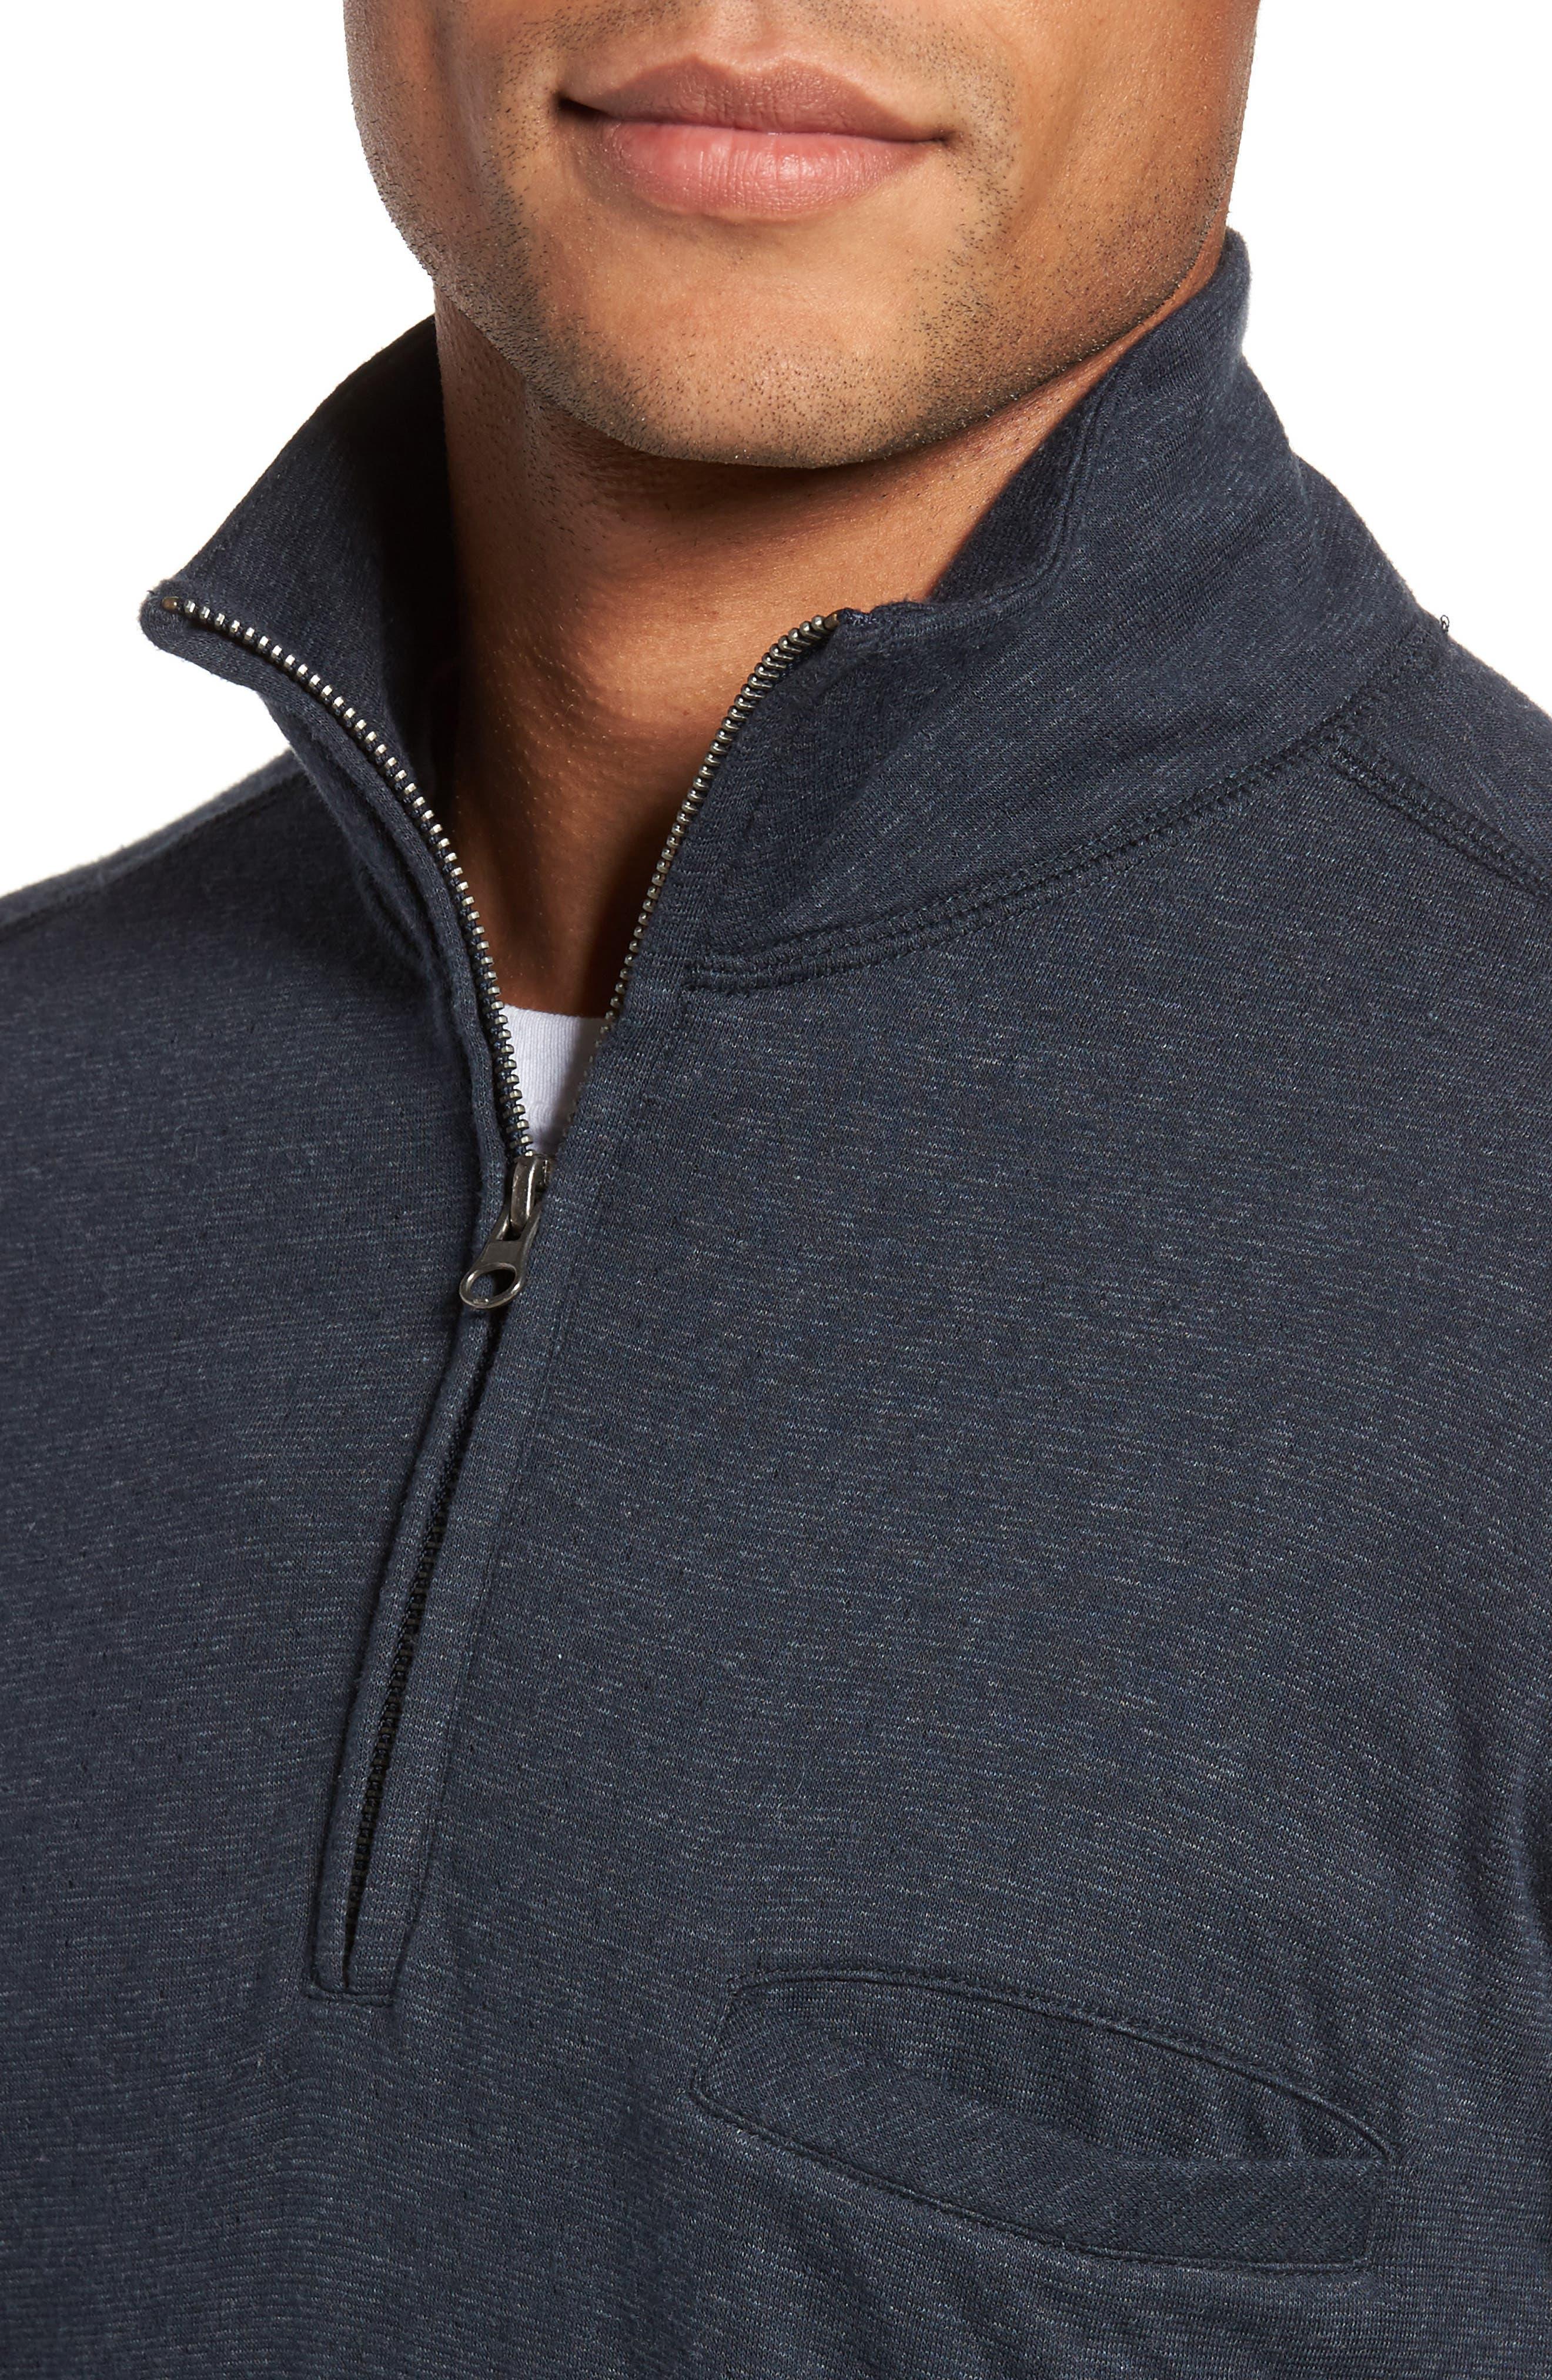 Jordan Quarter Zip Pullover,                             Alternate thumbnail 4, color,                             Carbon Blue